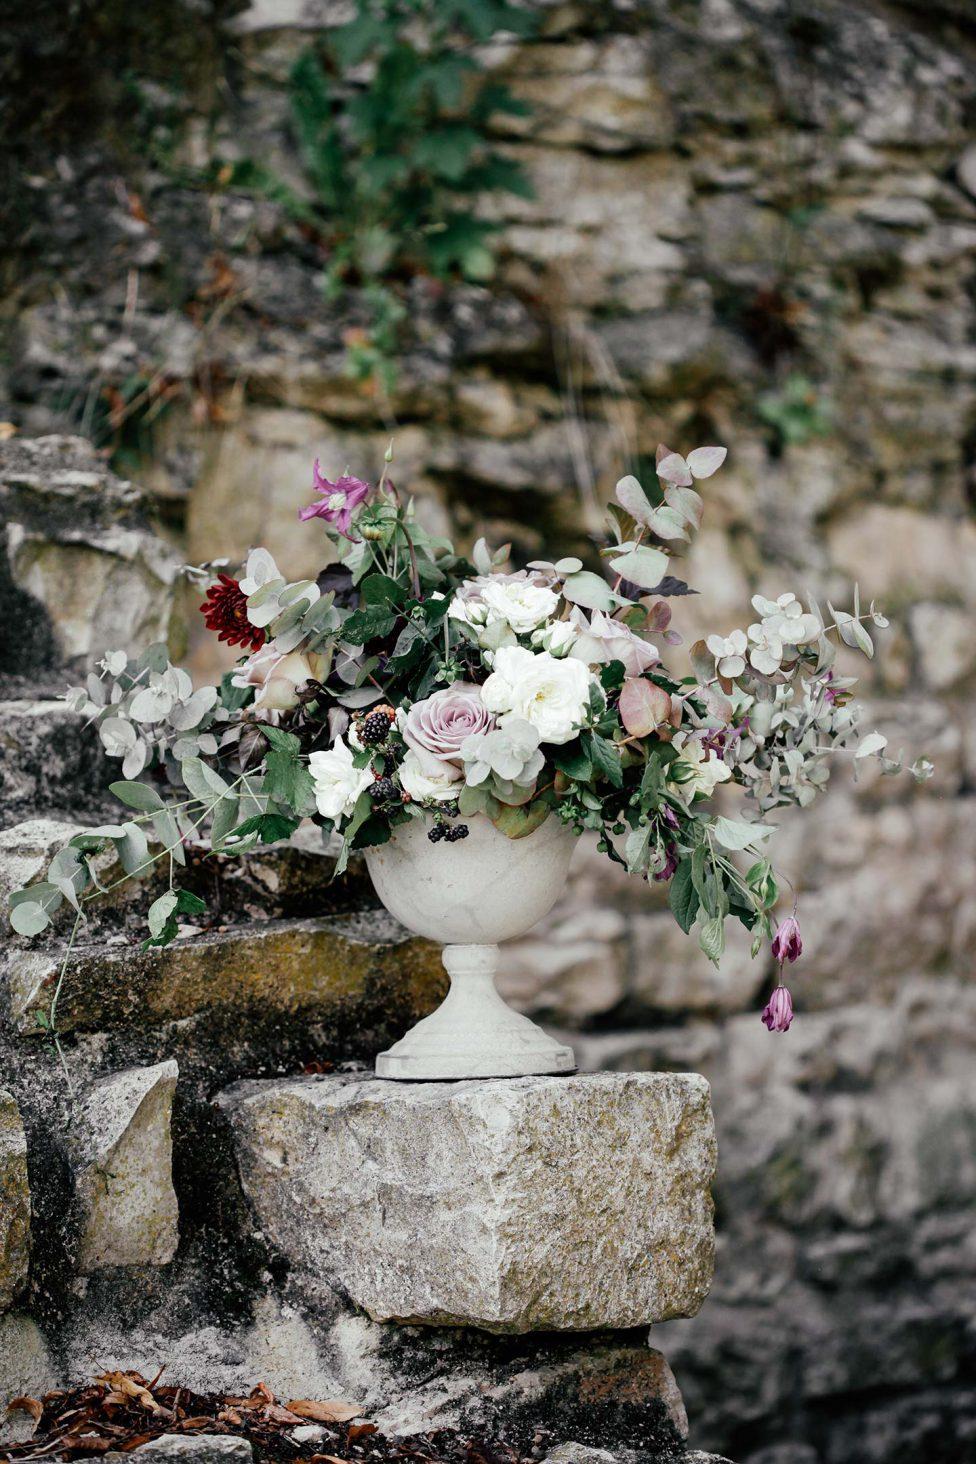 Burg Treuchtlingen: Fall in Love